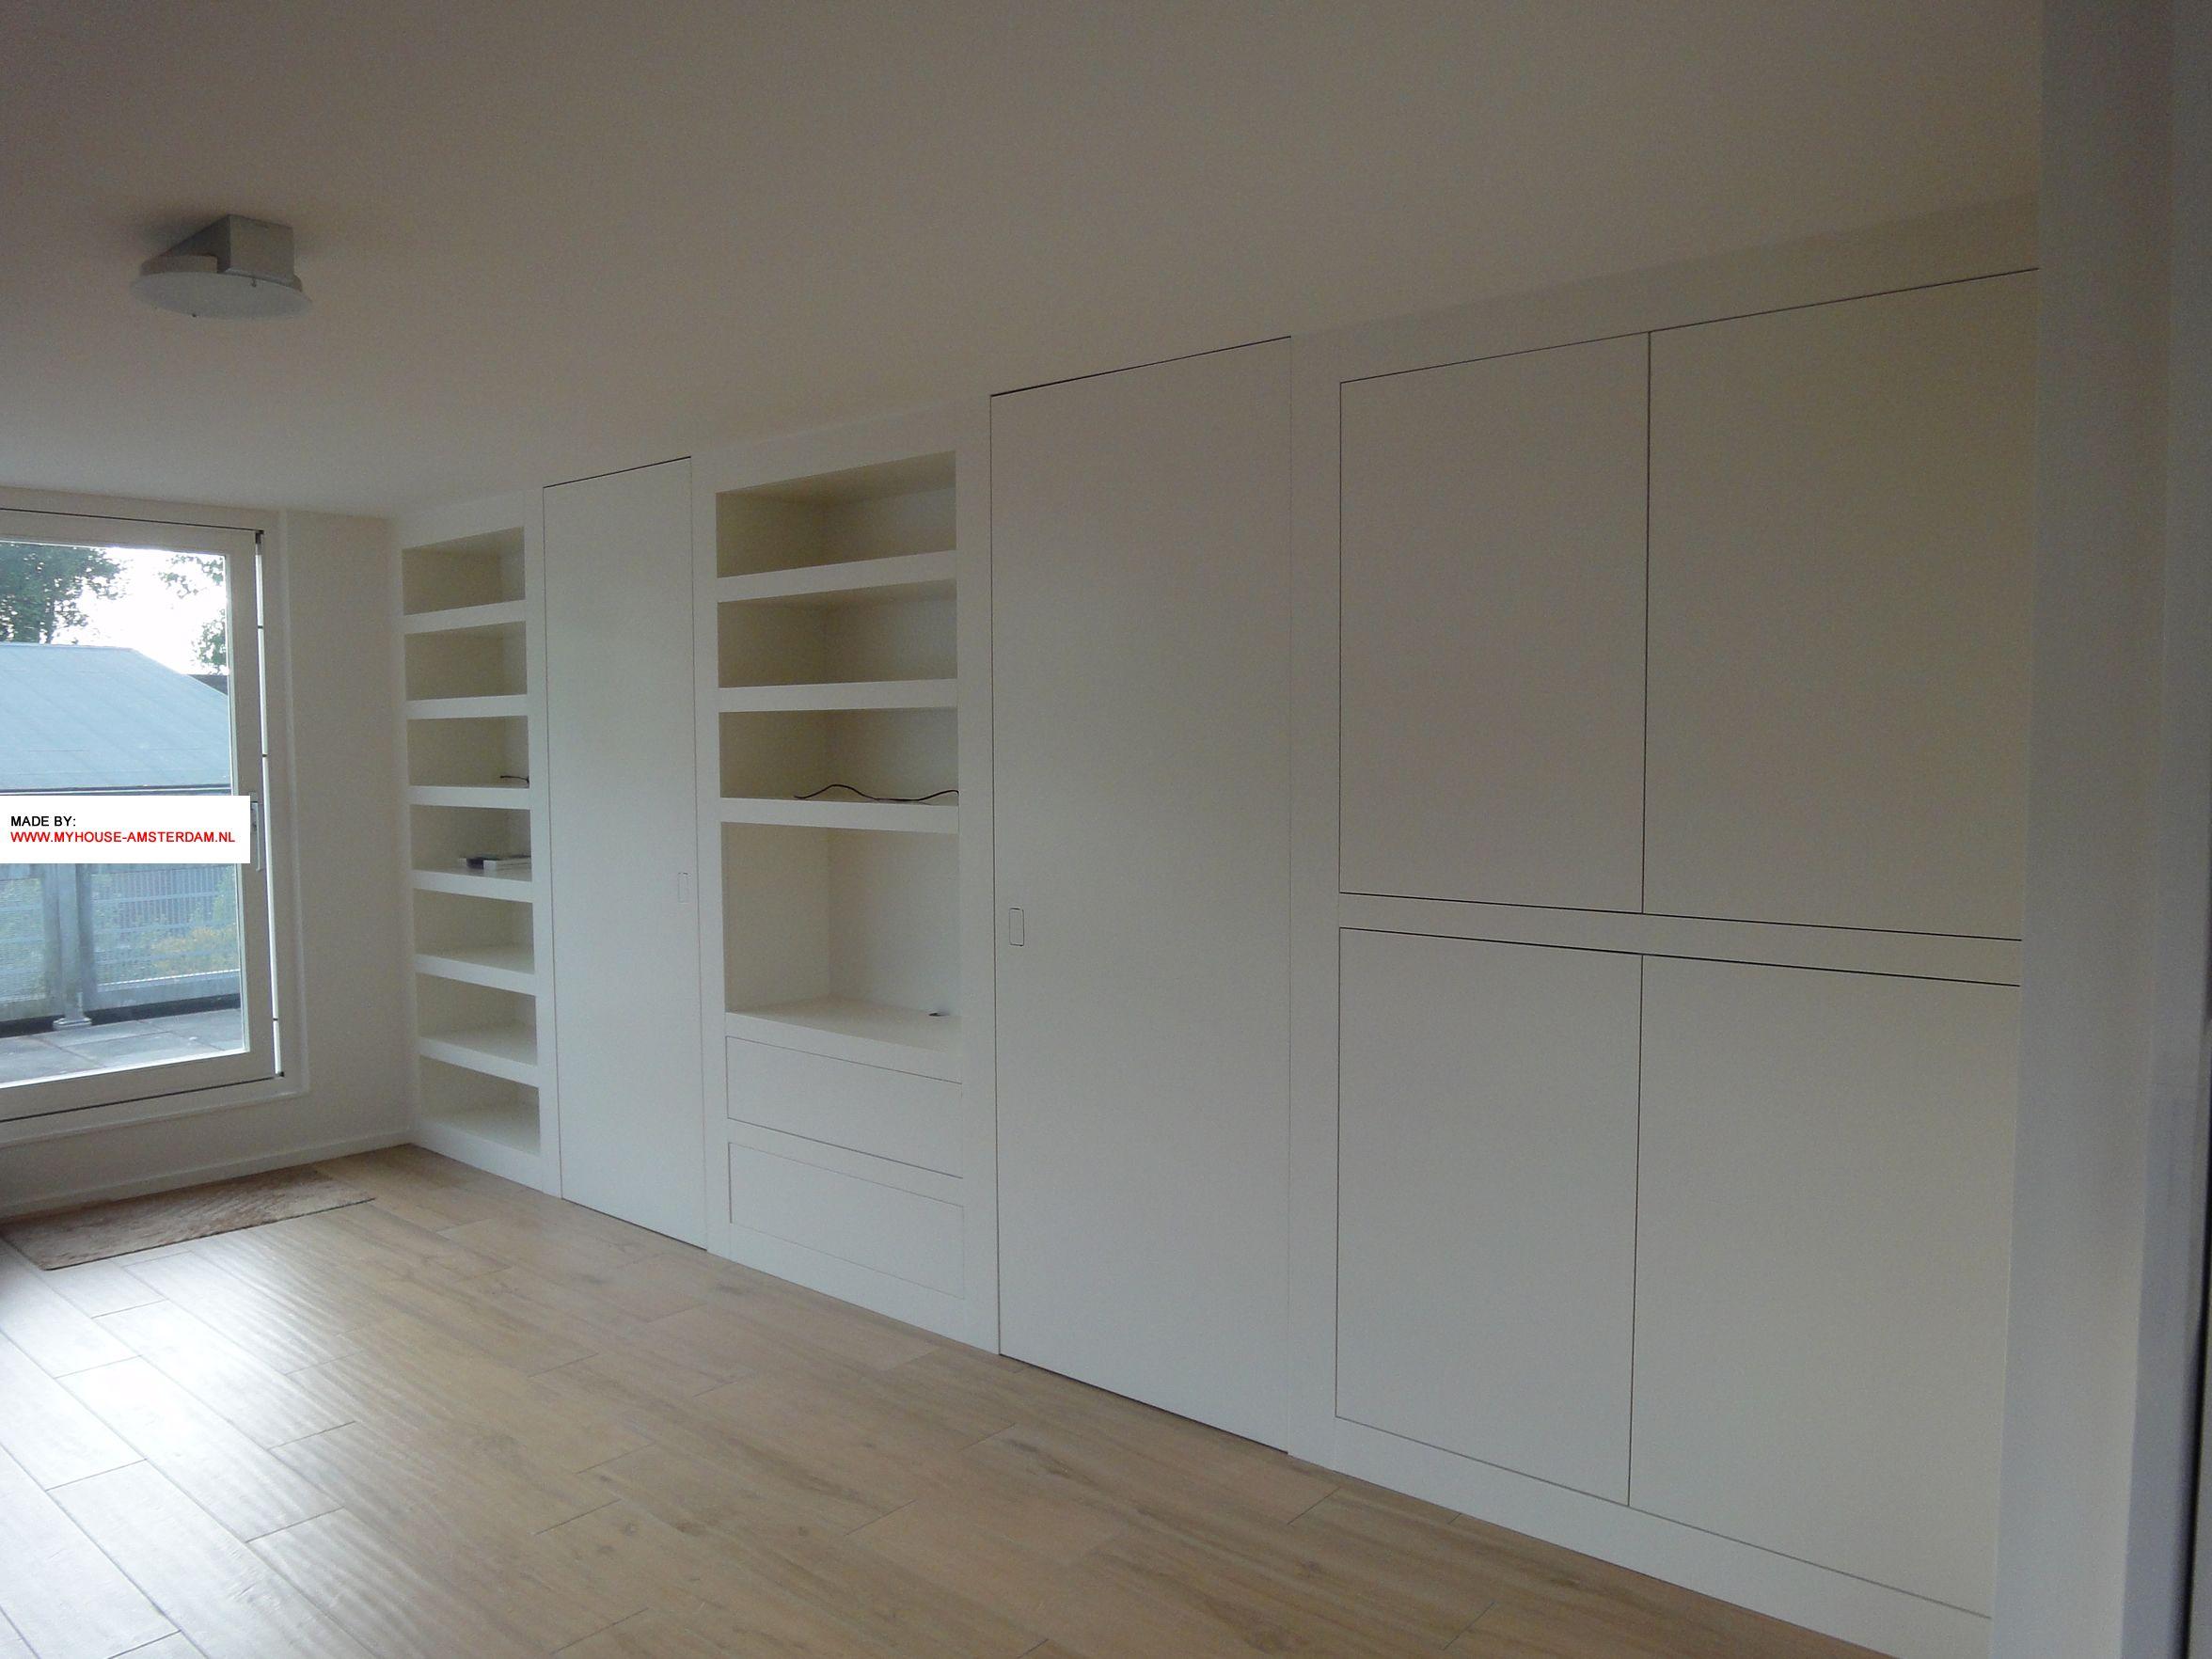 Bookcase and wardrobe modern in one wall modern wandvullend design